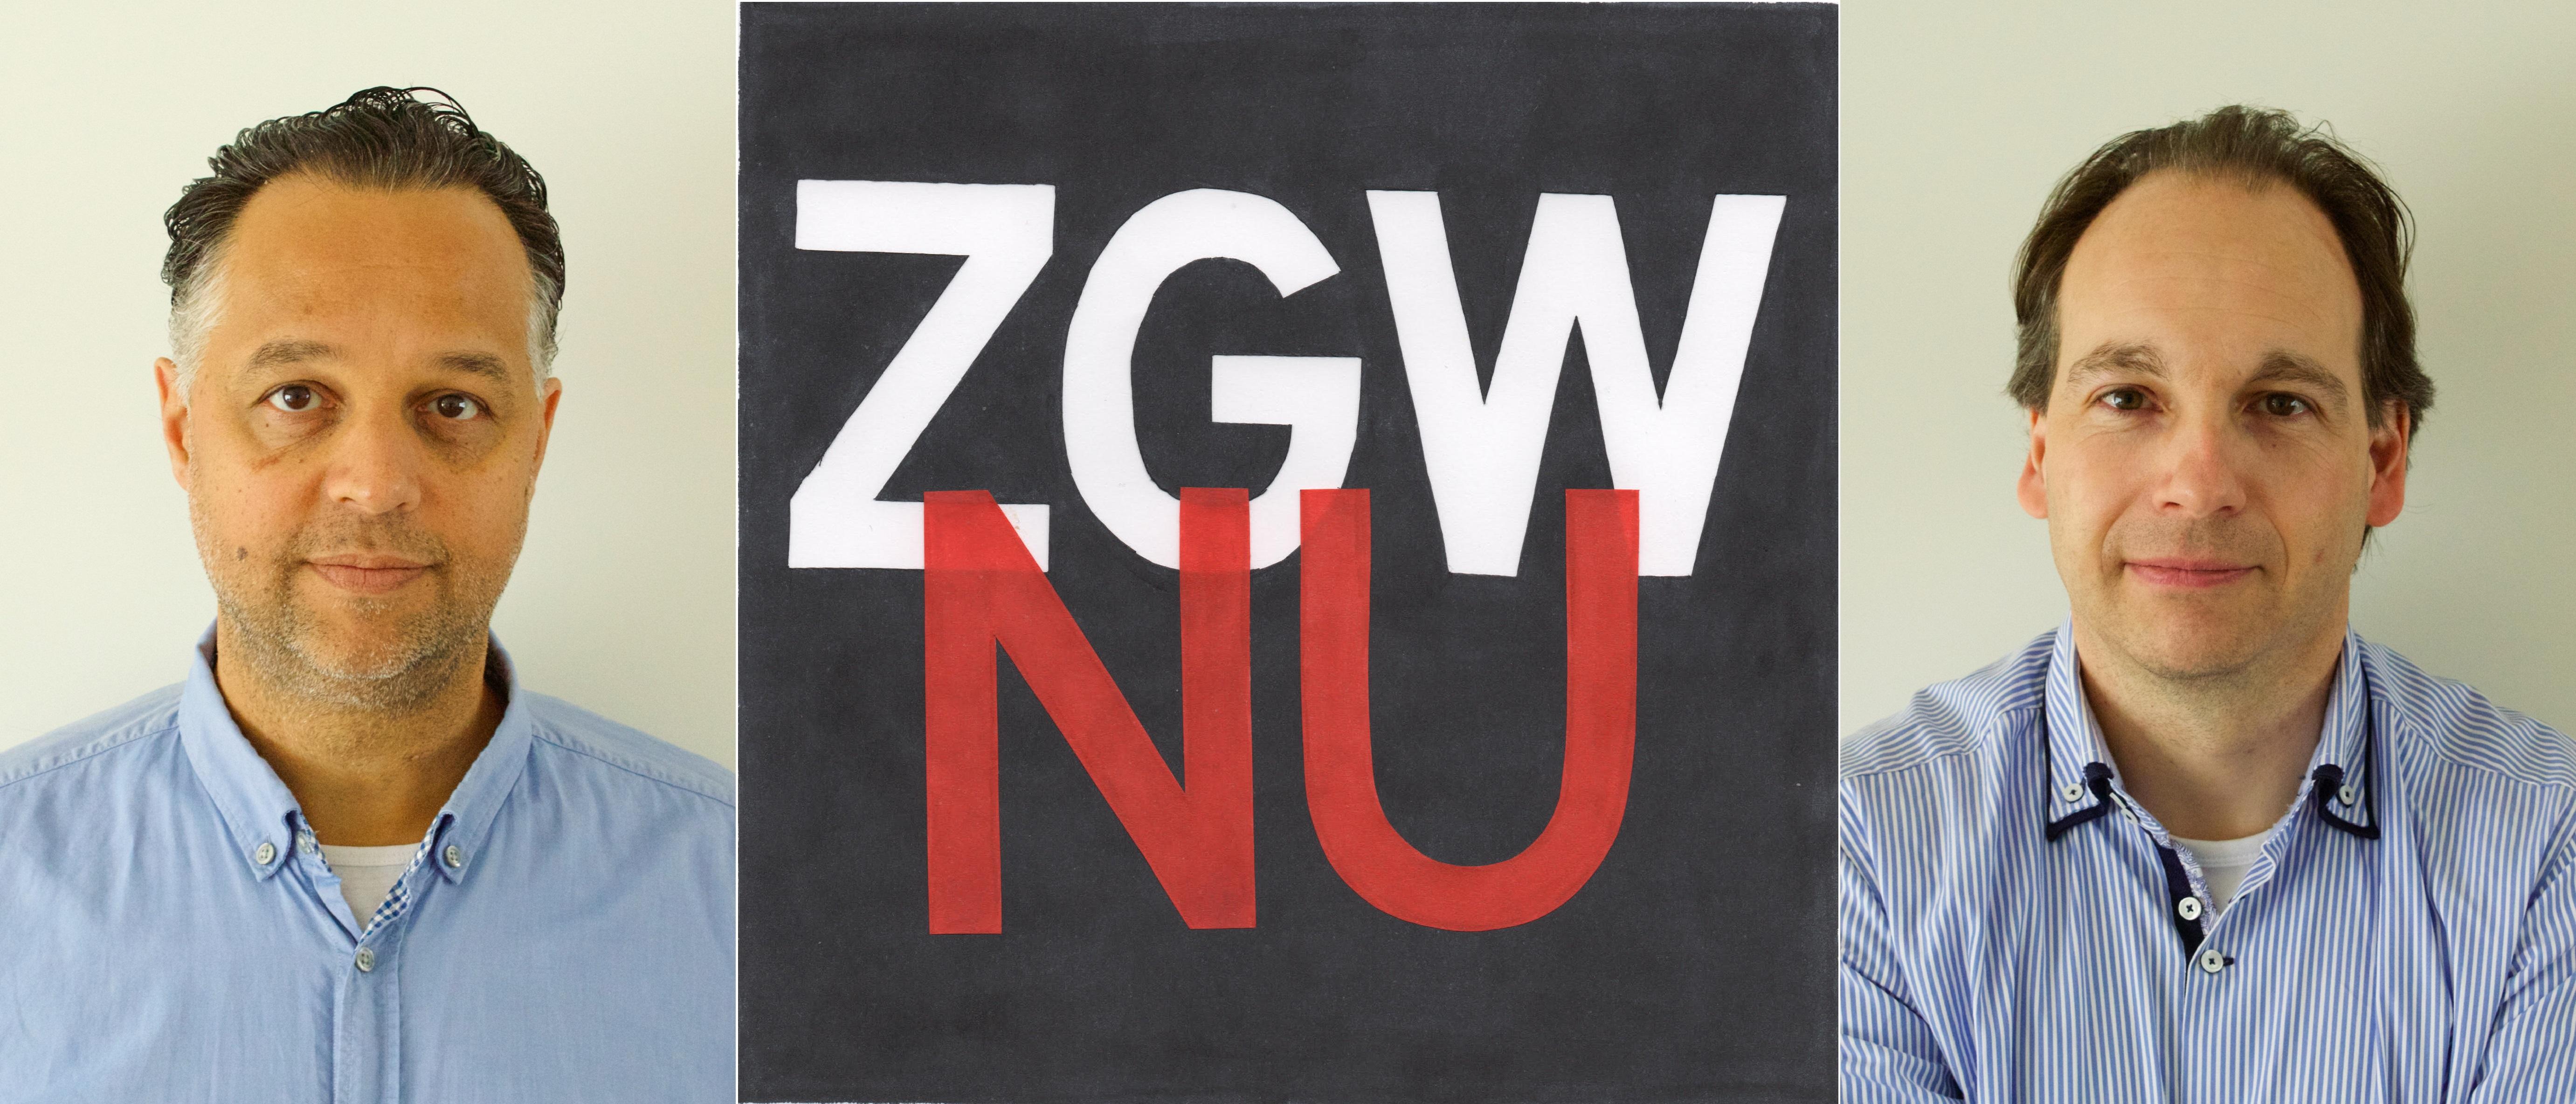 ZGW.nu